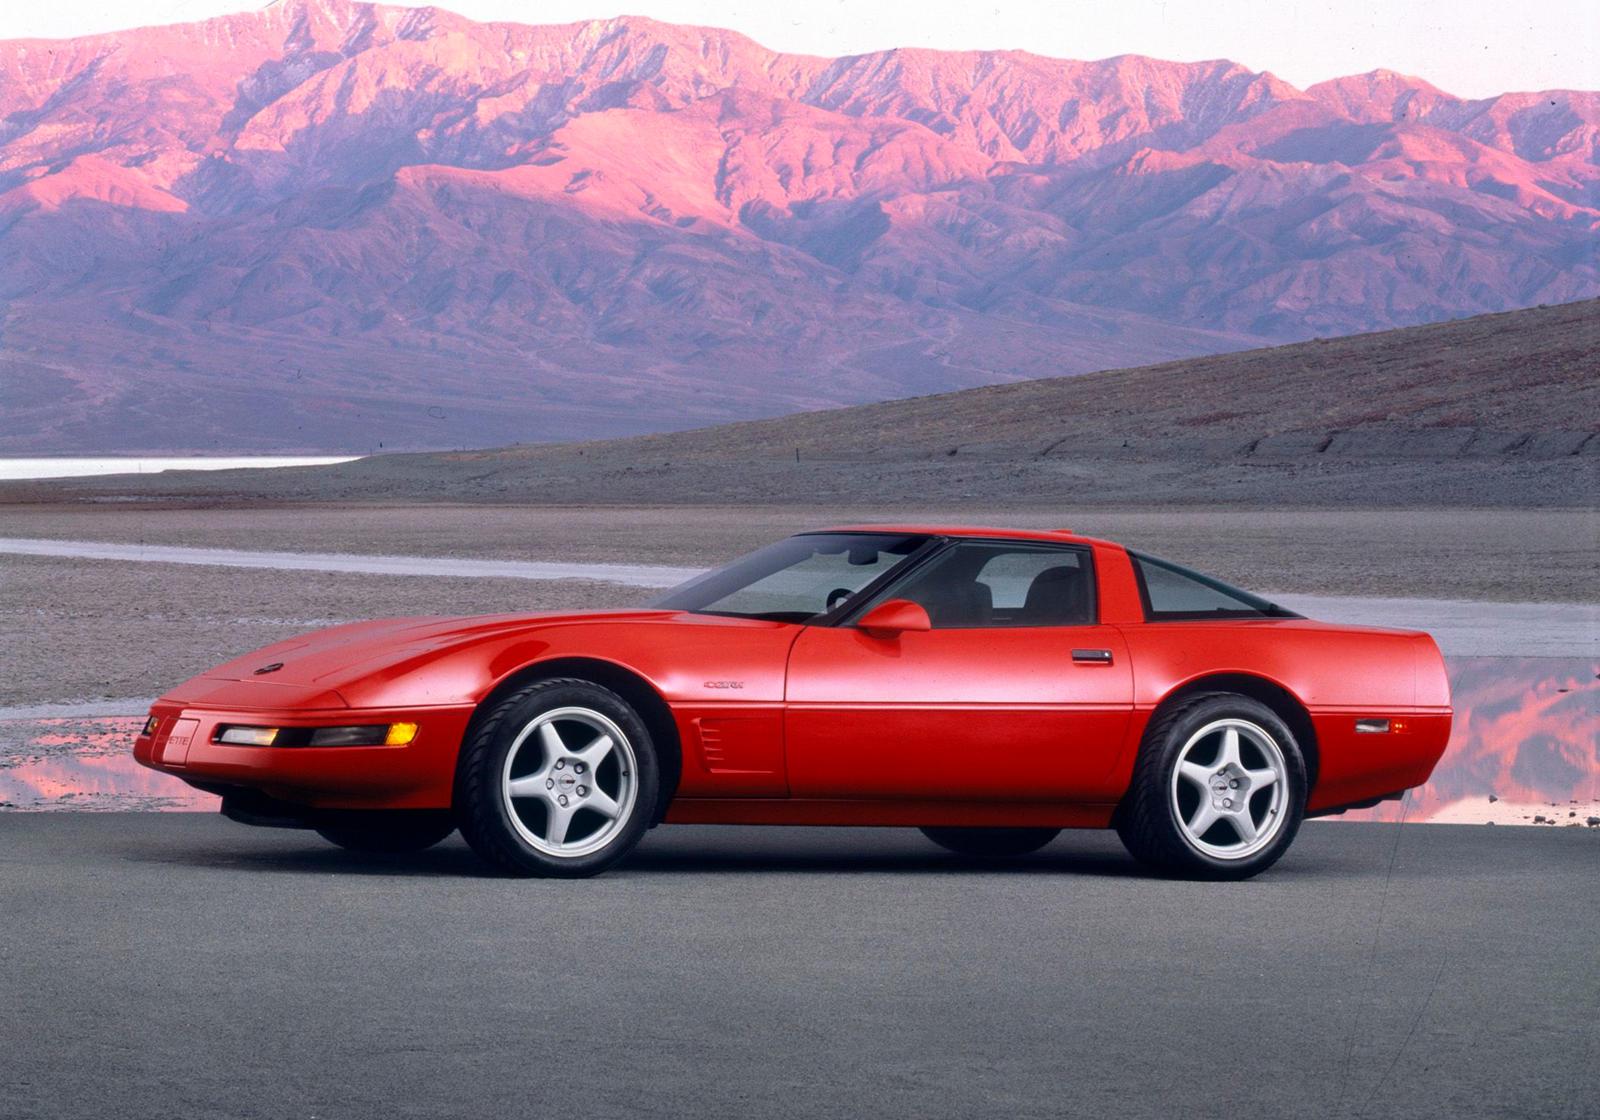 Kelebihan Corvette C4 Zr1 Tangguh